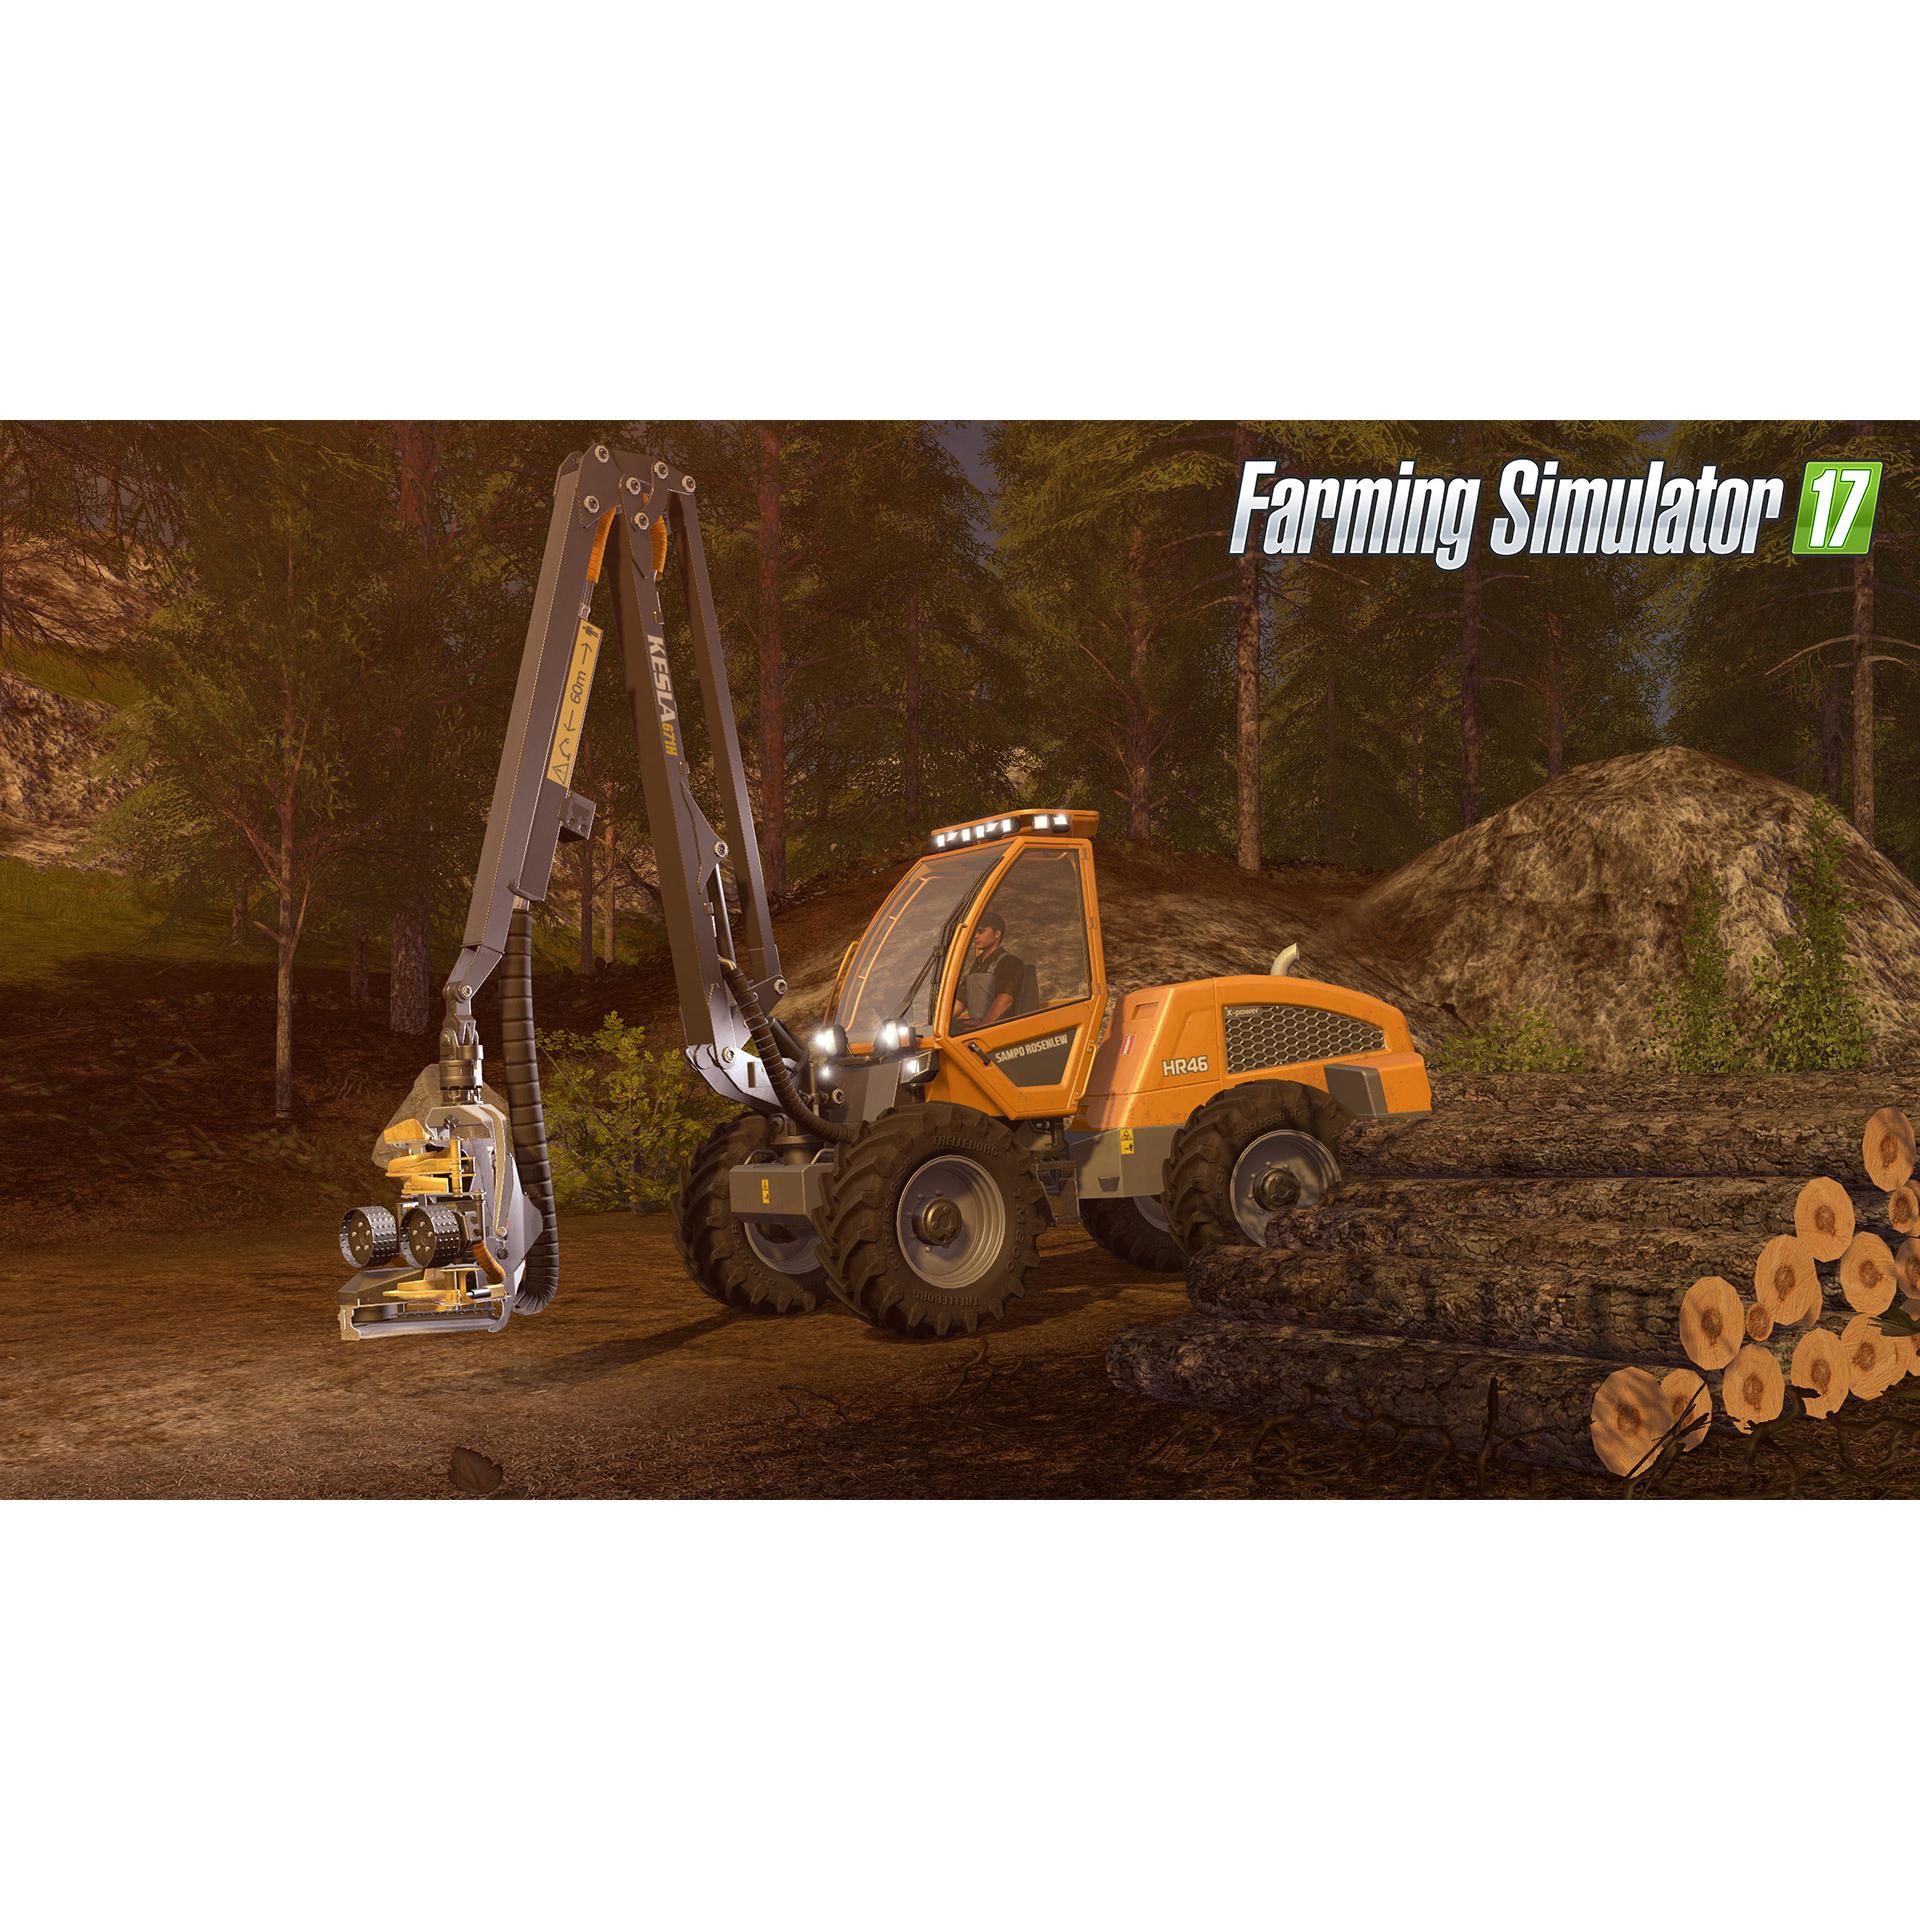 Farming simulator 17 Platinum edition, Xbox One 6